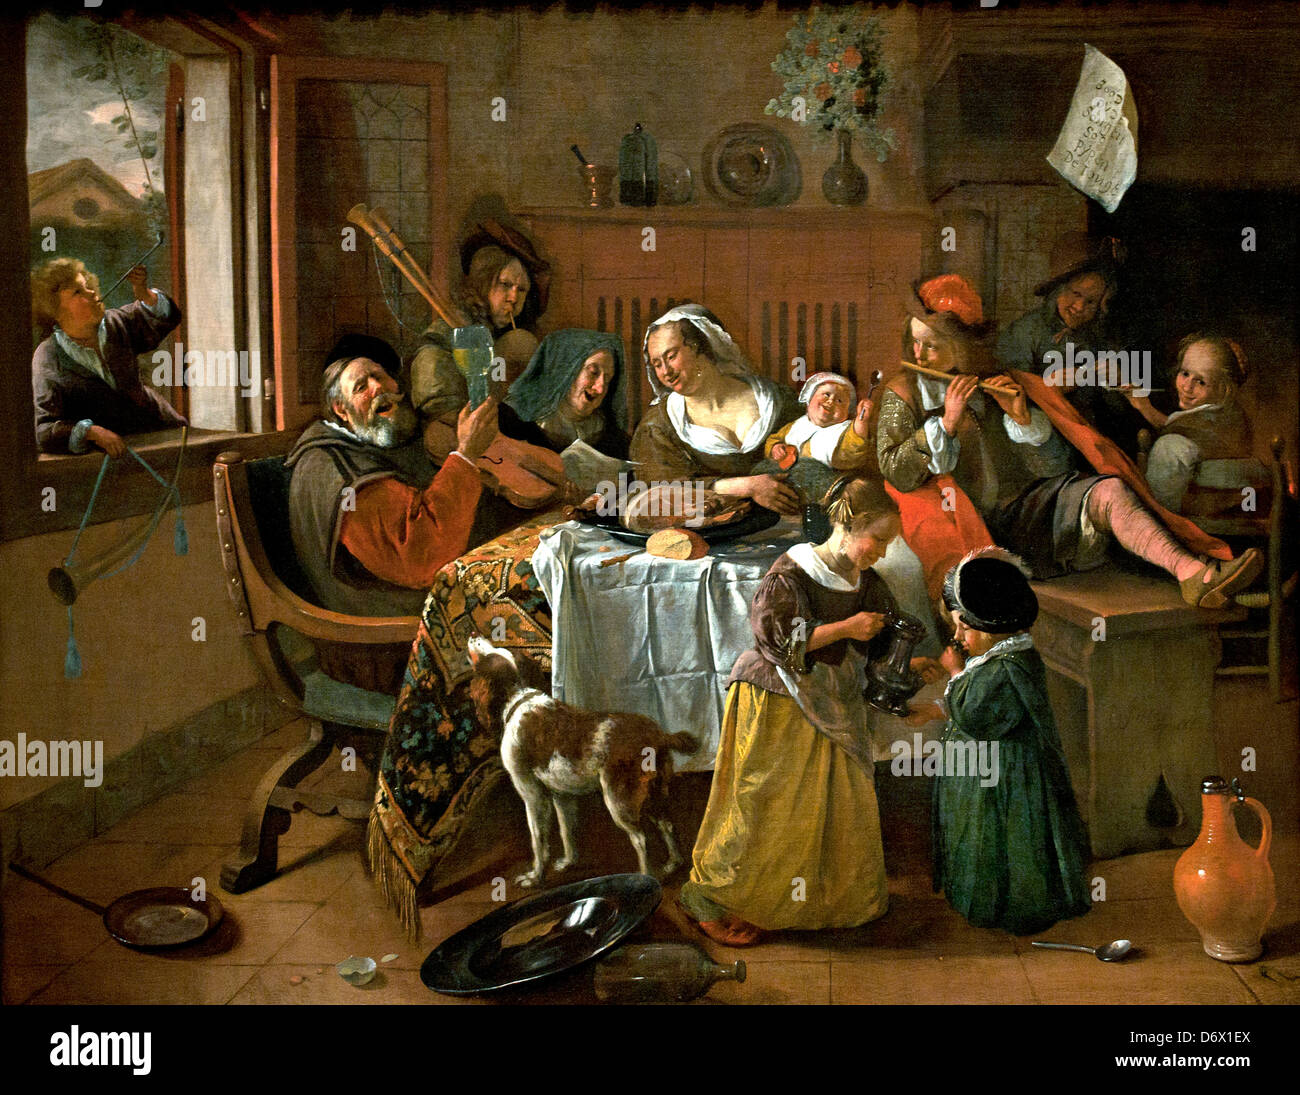 The Merry Family 1668 Jan Havickszoon Steen 1626 - 1679 Netherlands Dutch Holland - Stock Image